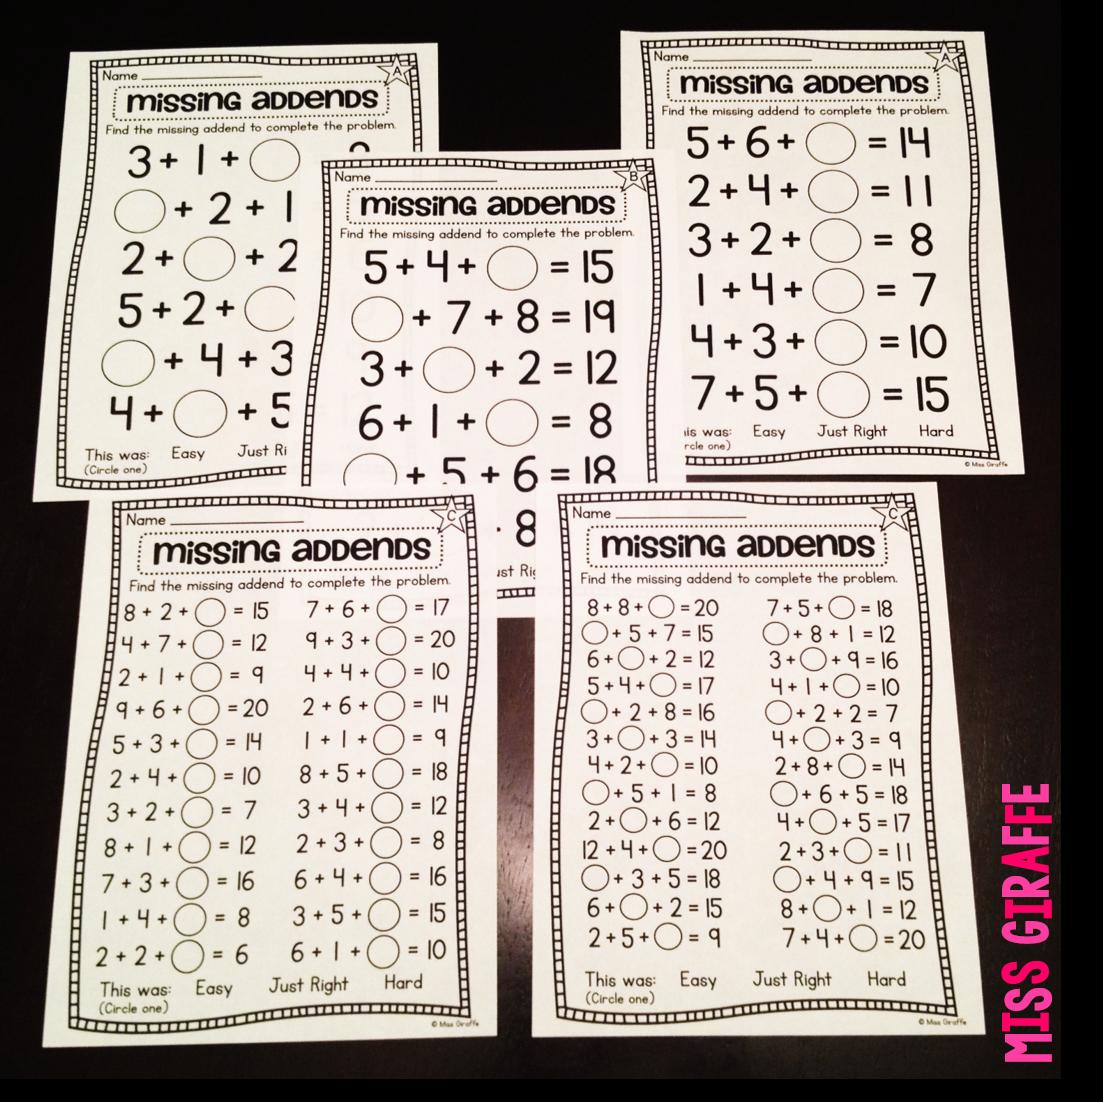 Miss Giraffe's Class: Adding 3 Numbers [ 1102 x 1103 Pixel ]